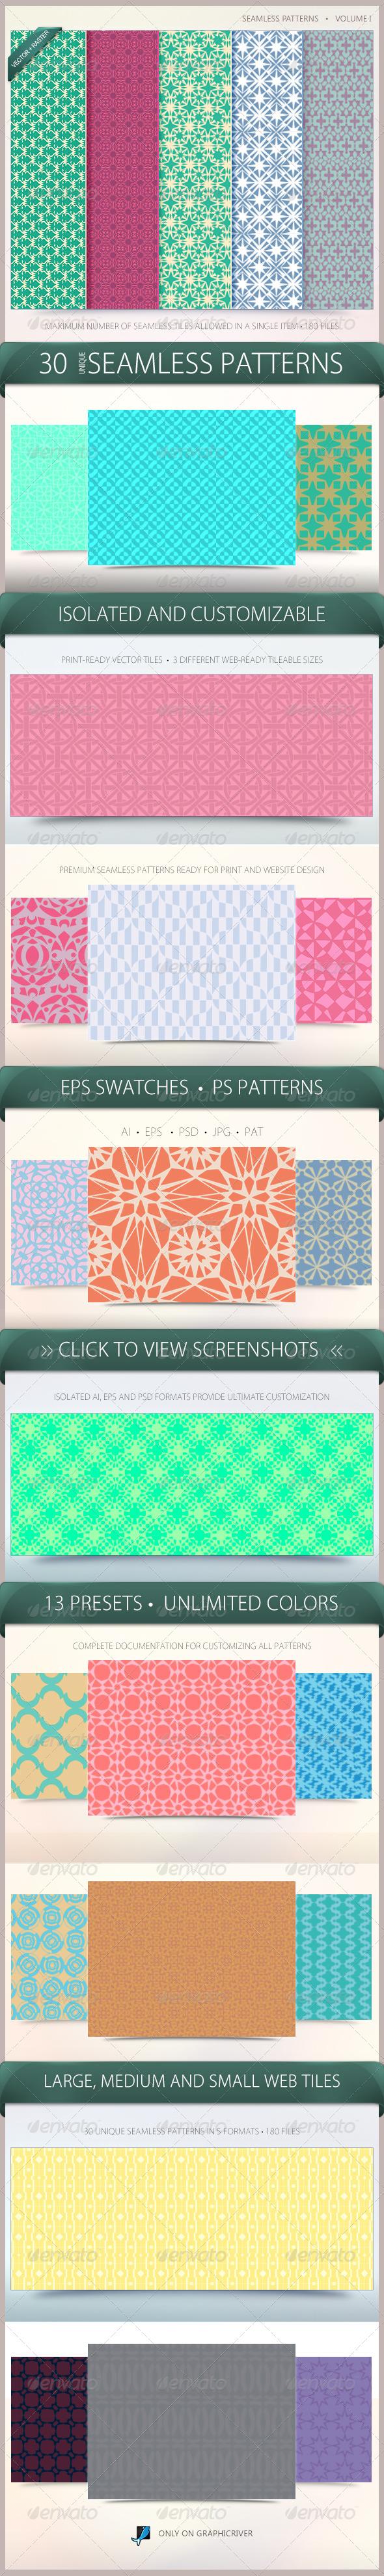 GraphicRiver Seamless Patterns Volume 1 6564604